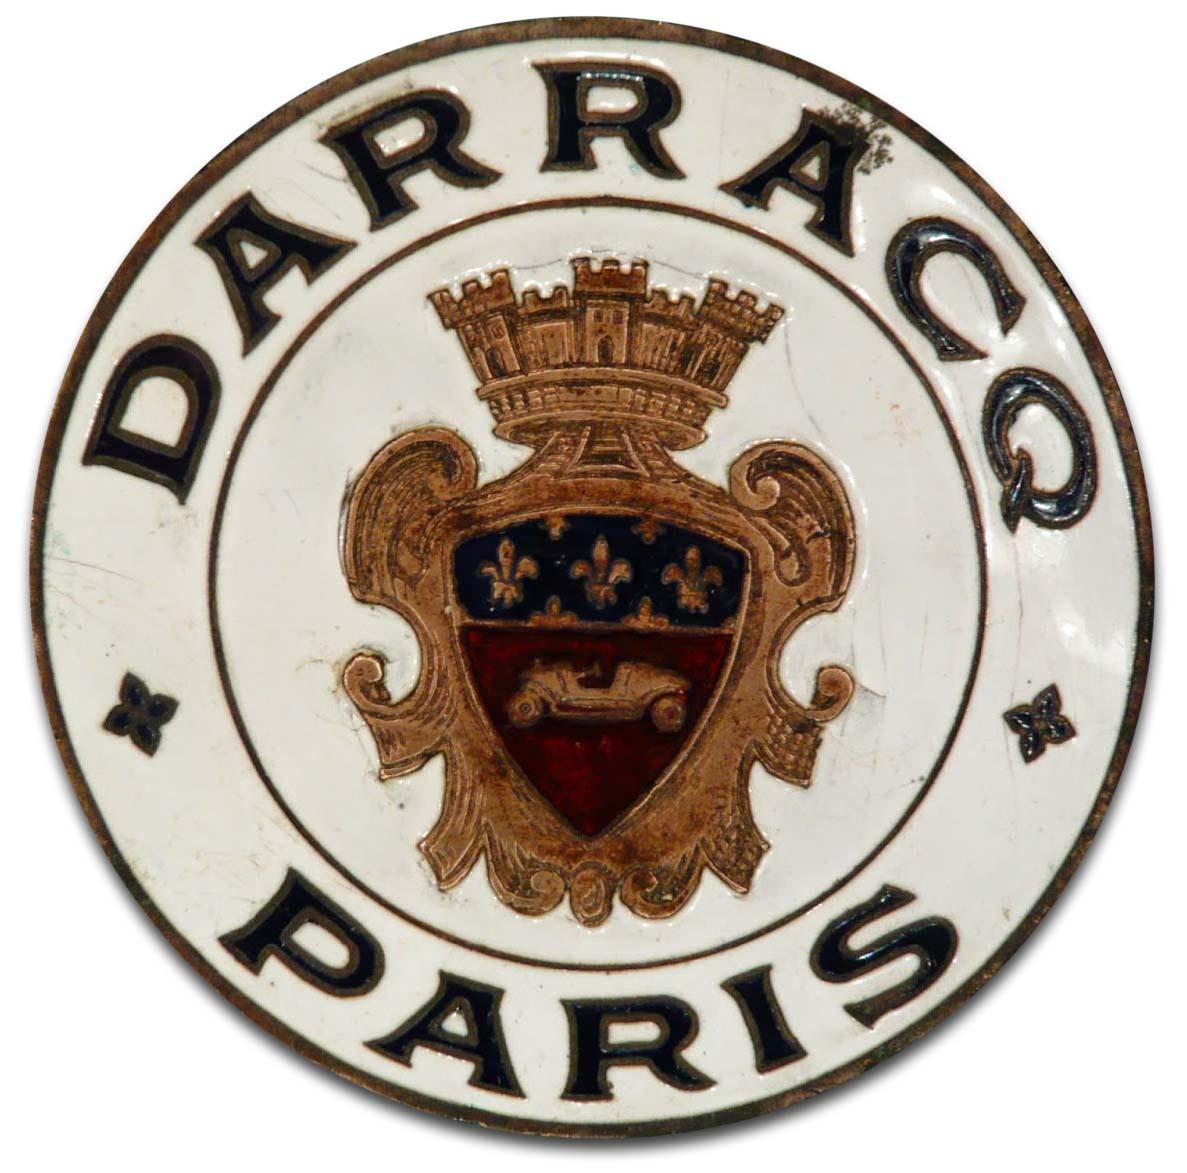 Darracq (1919)